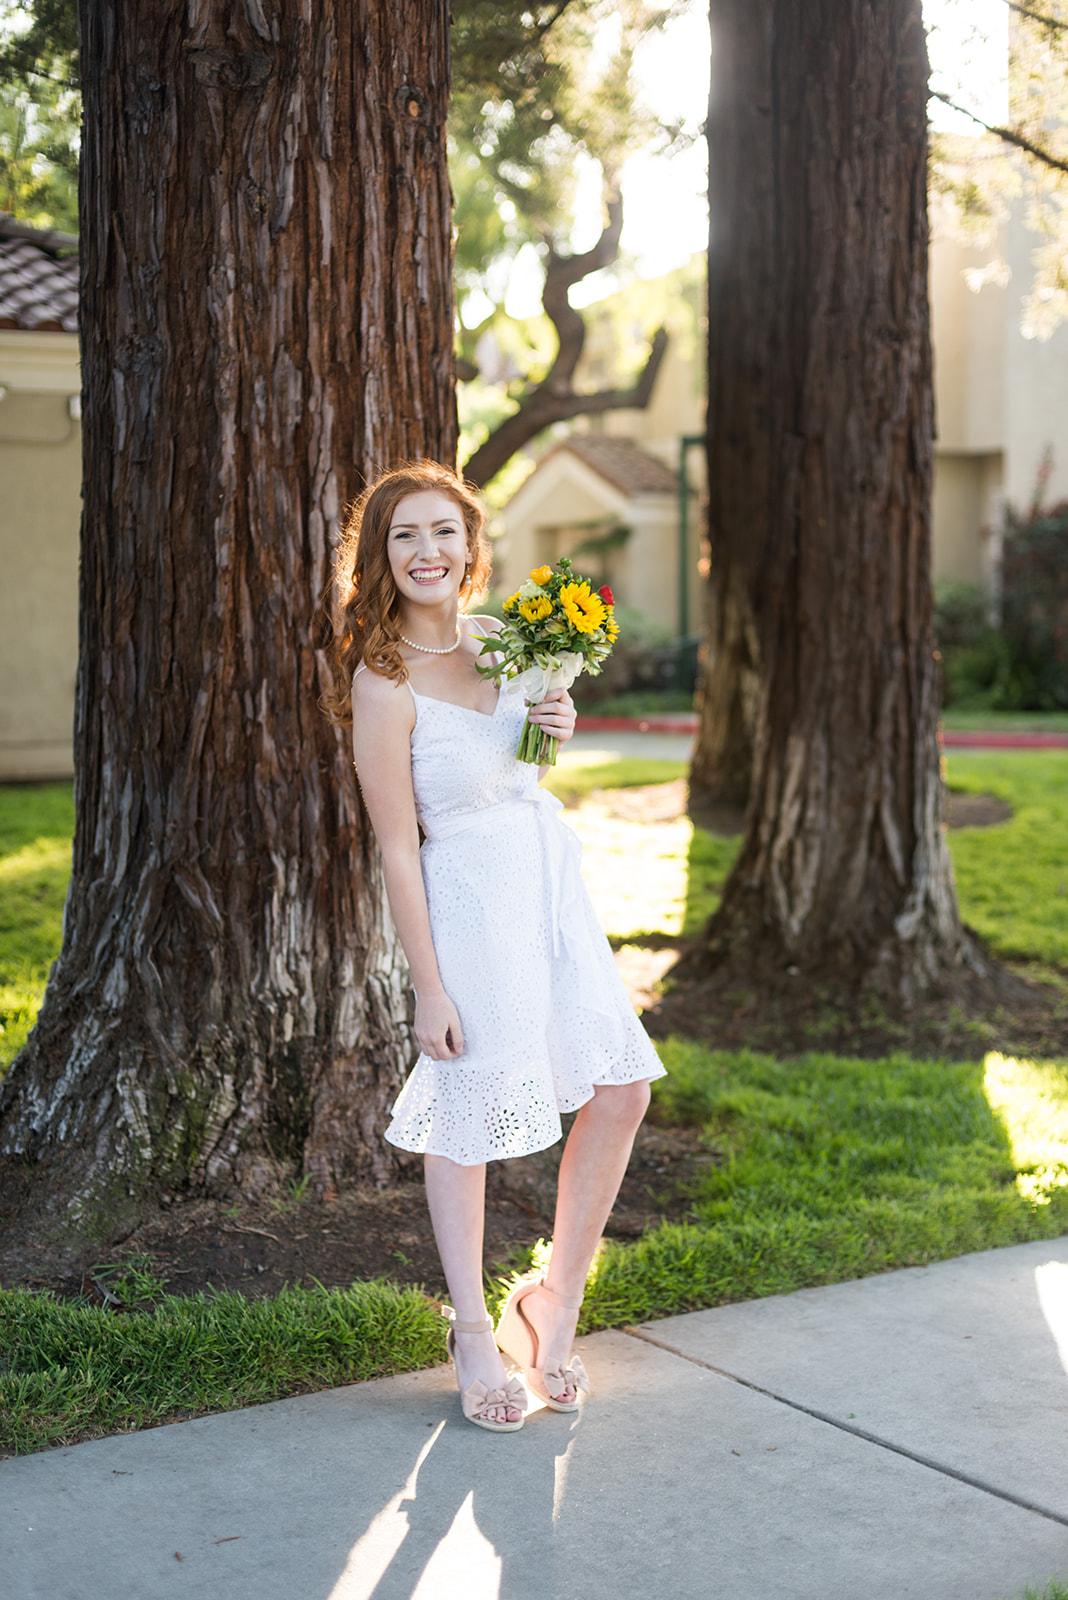 my top 3 outdoor photography lighting tips